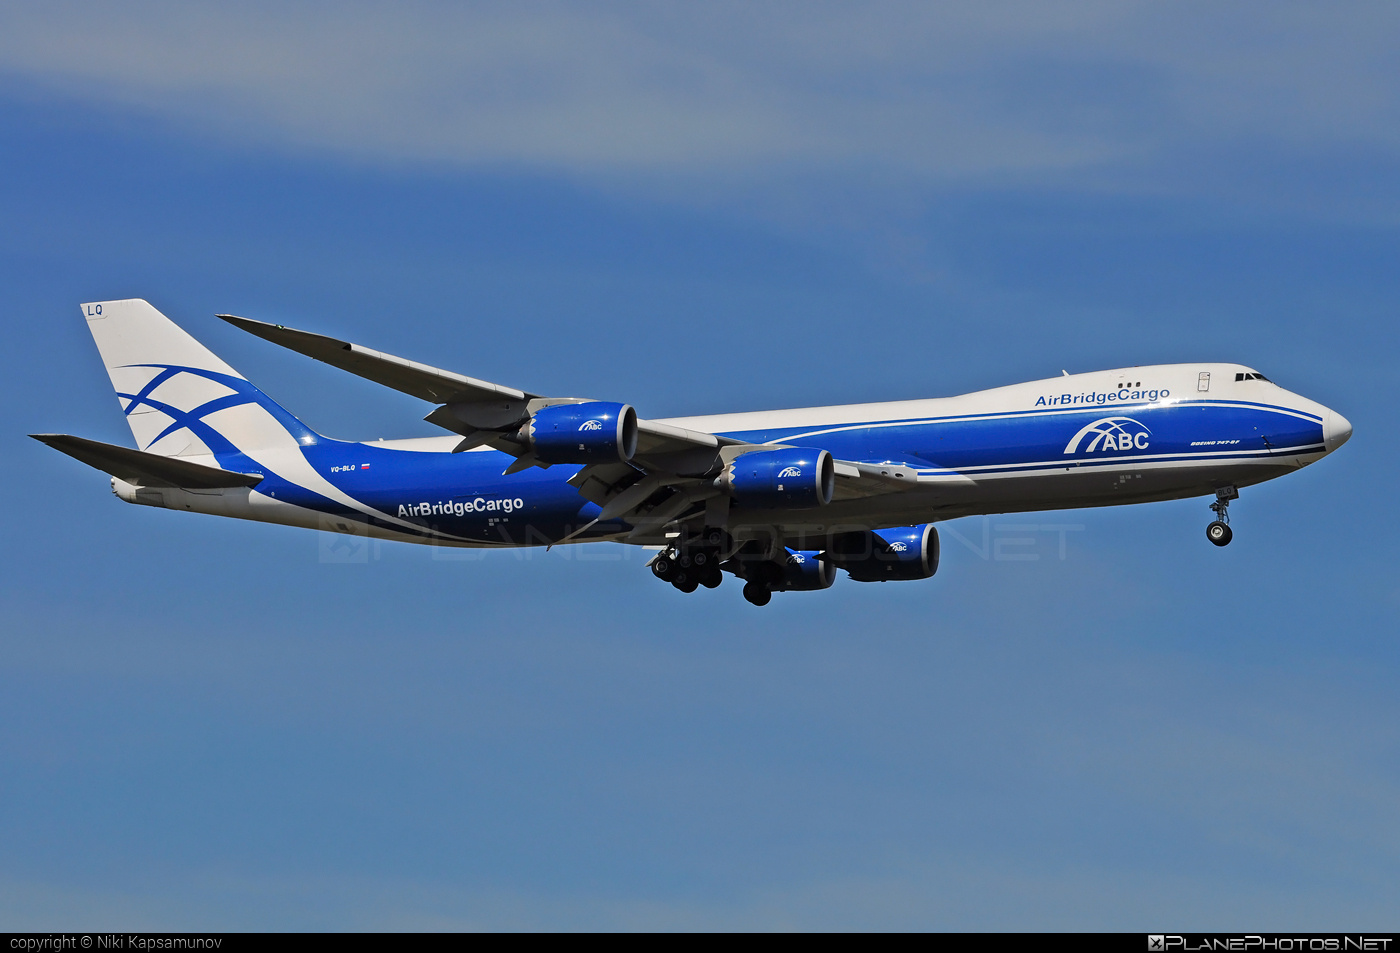 Boeing 747-8F - VQ-BLQ operated by AirBridgeCargo #airbridgecargo #b747 #b747f #b747freighter #boeing #boeing747 #jumbo